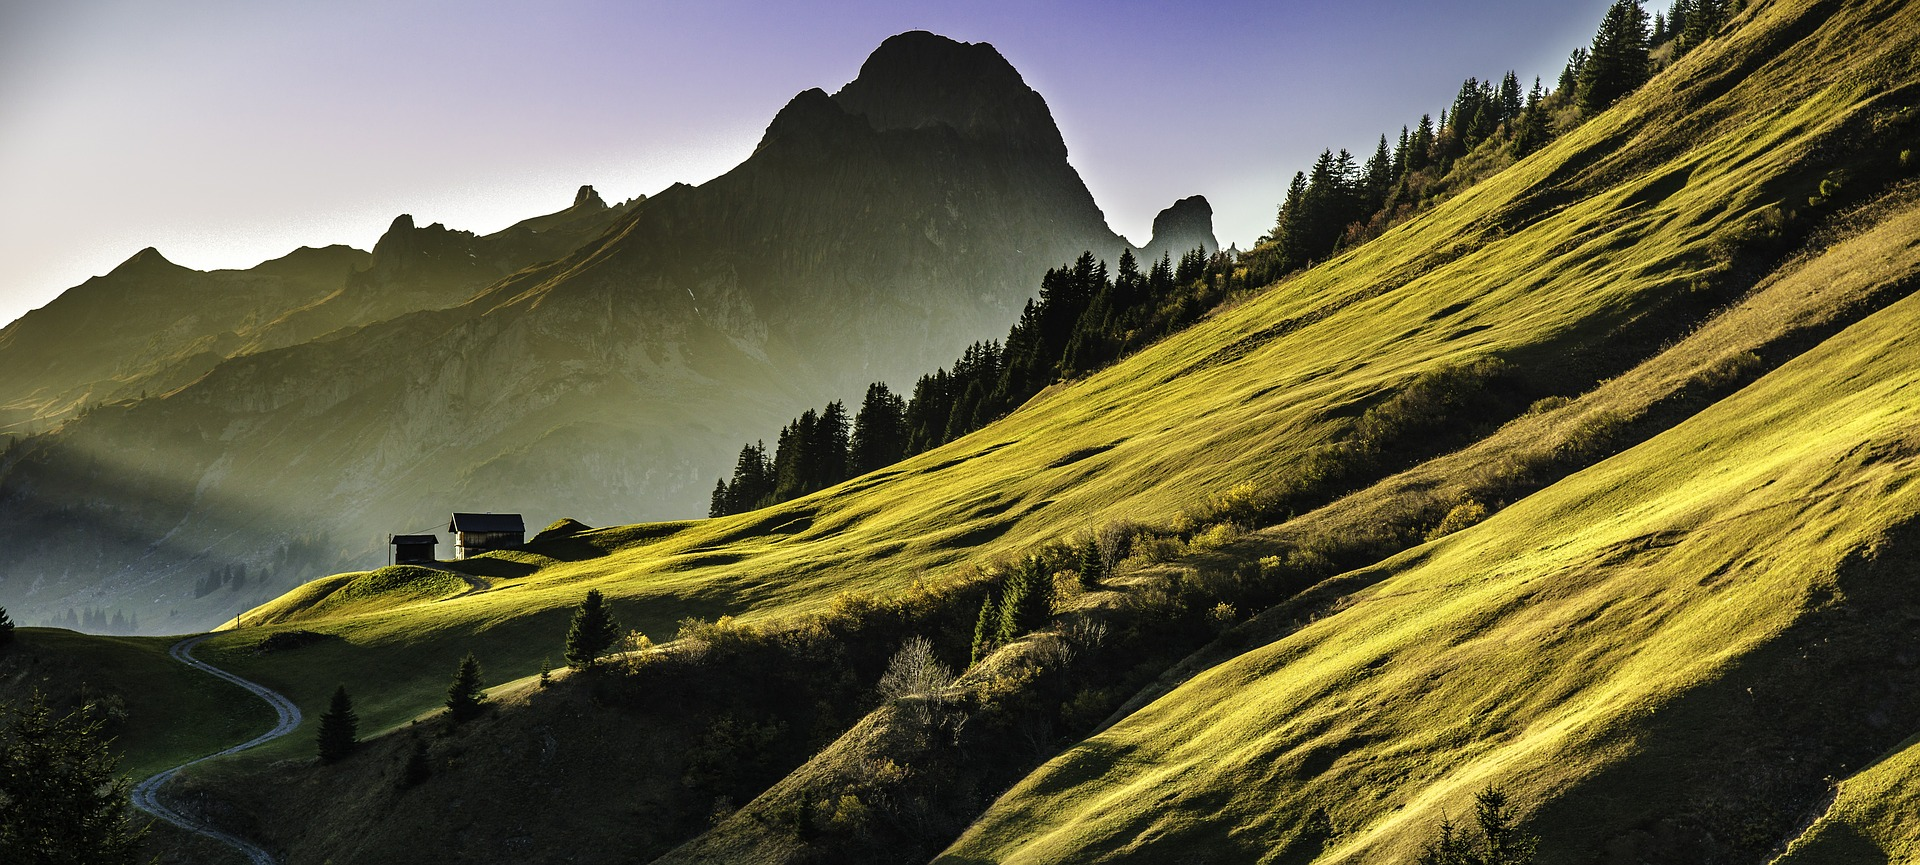 Ingolf Derkow und das Bergwandern Alpen Berglandschaft landscape-640617_1920